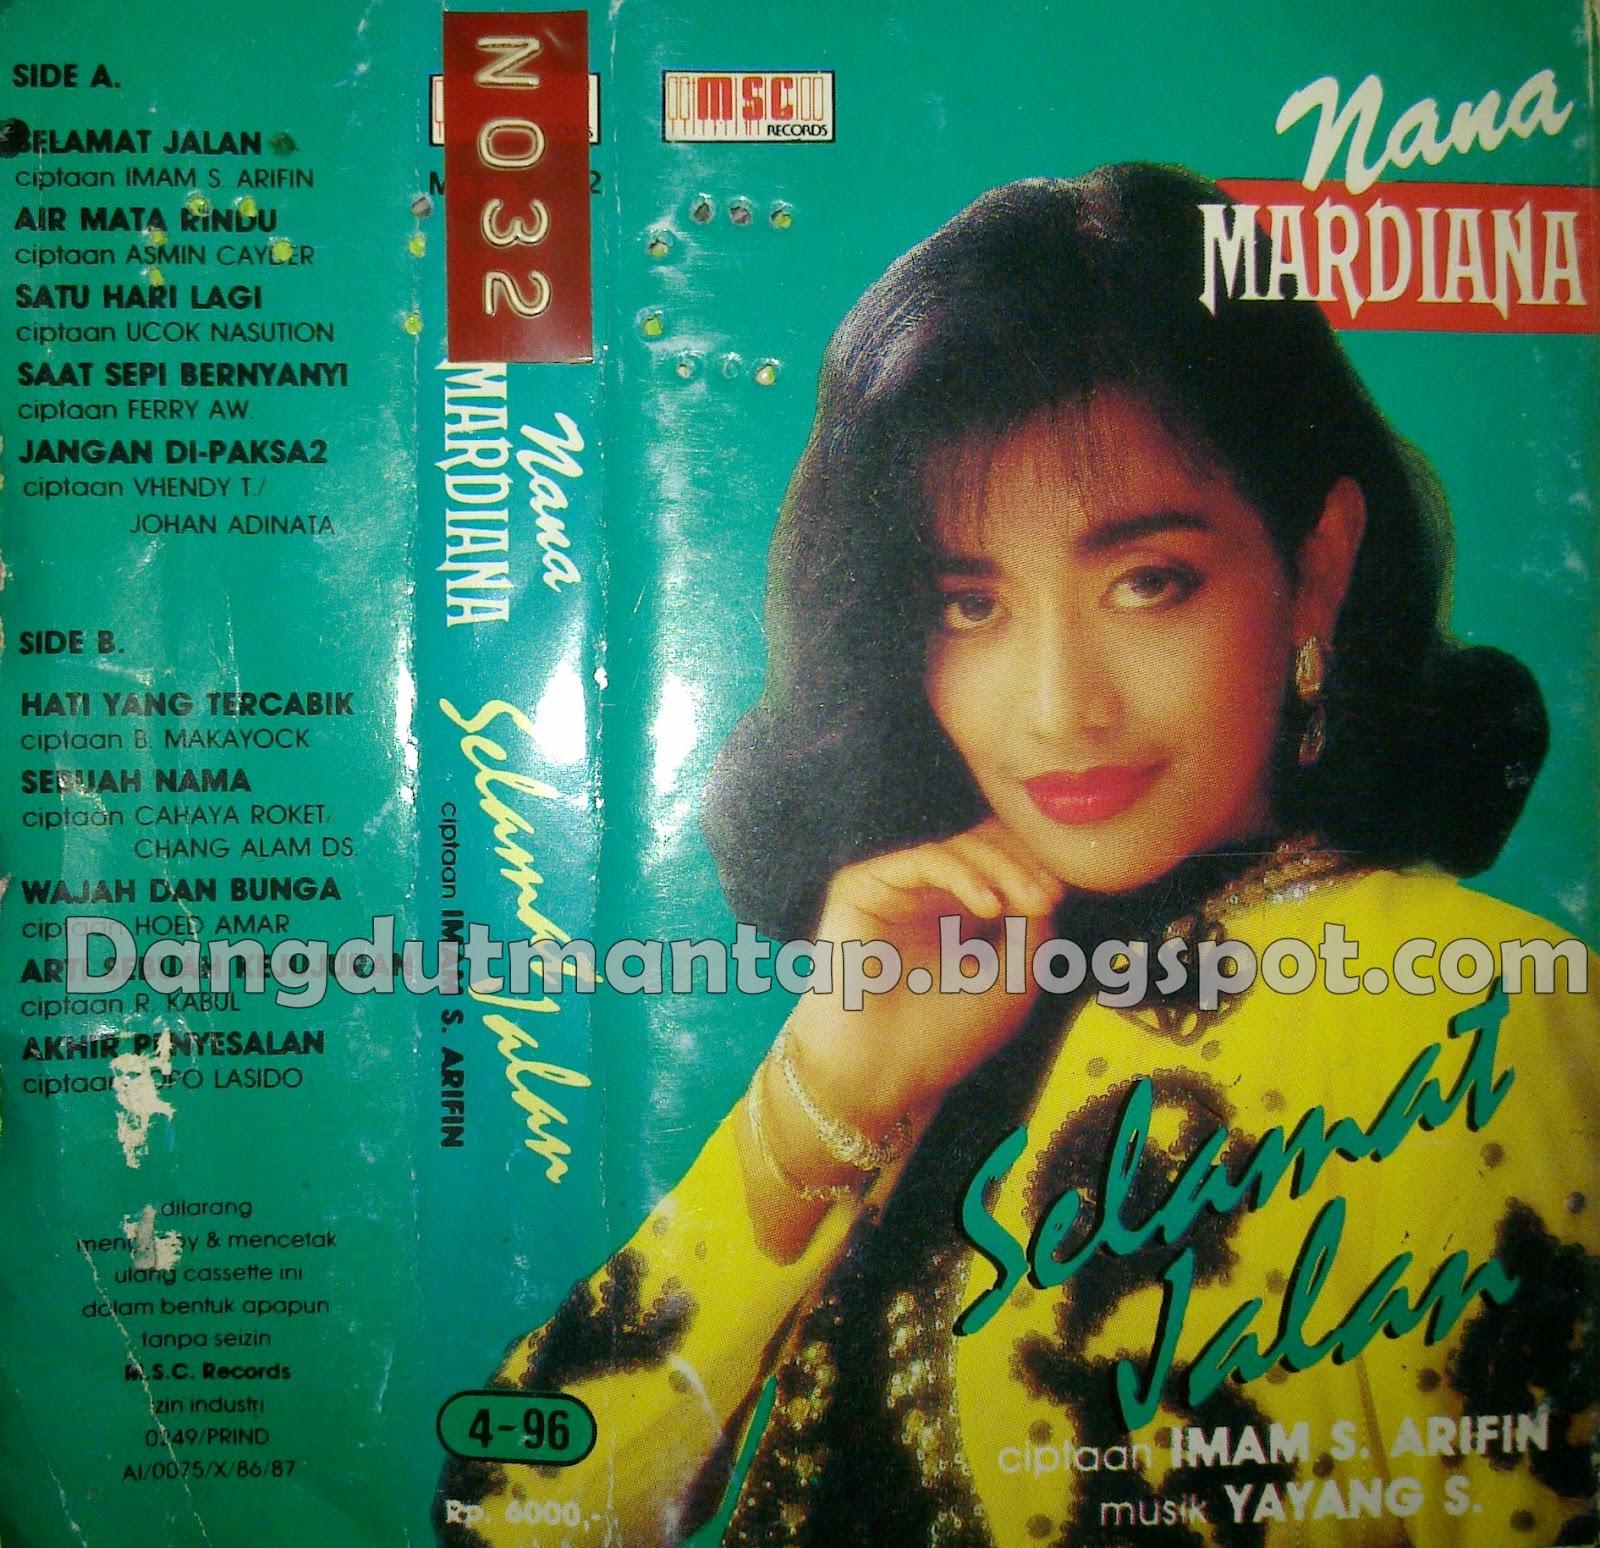 cassette dangdut nana mardiana selamat jalan 1996 msc